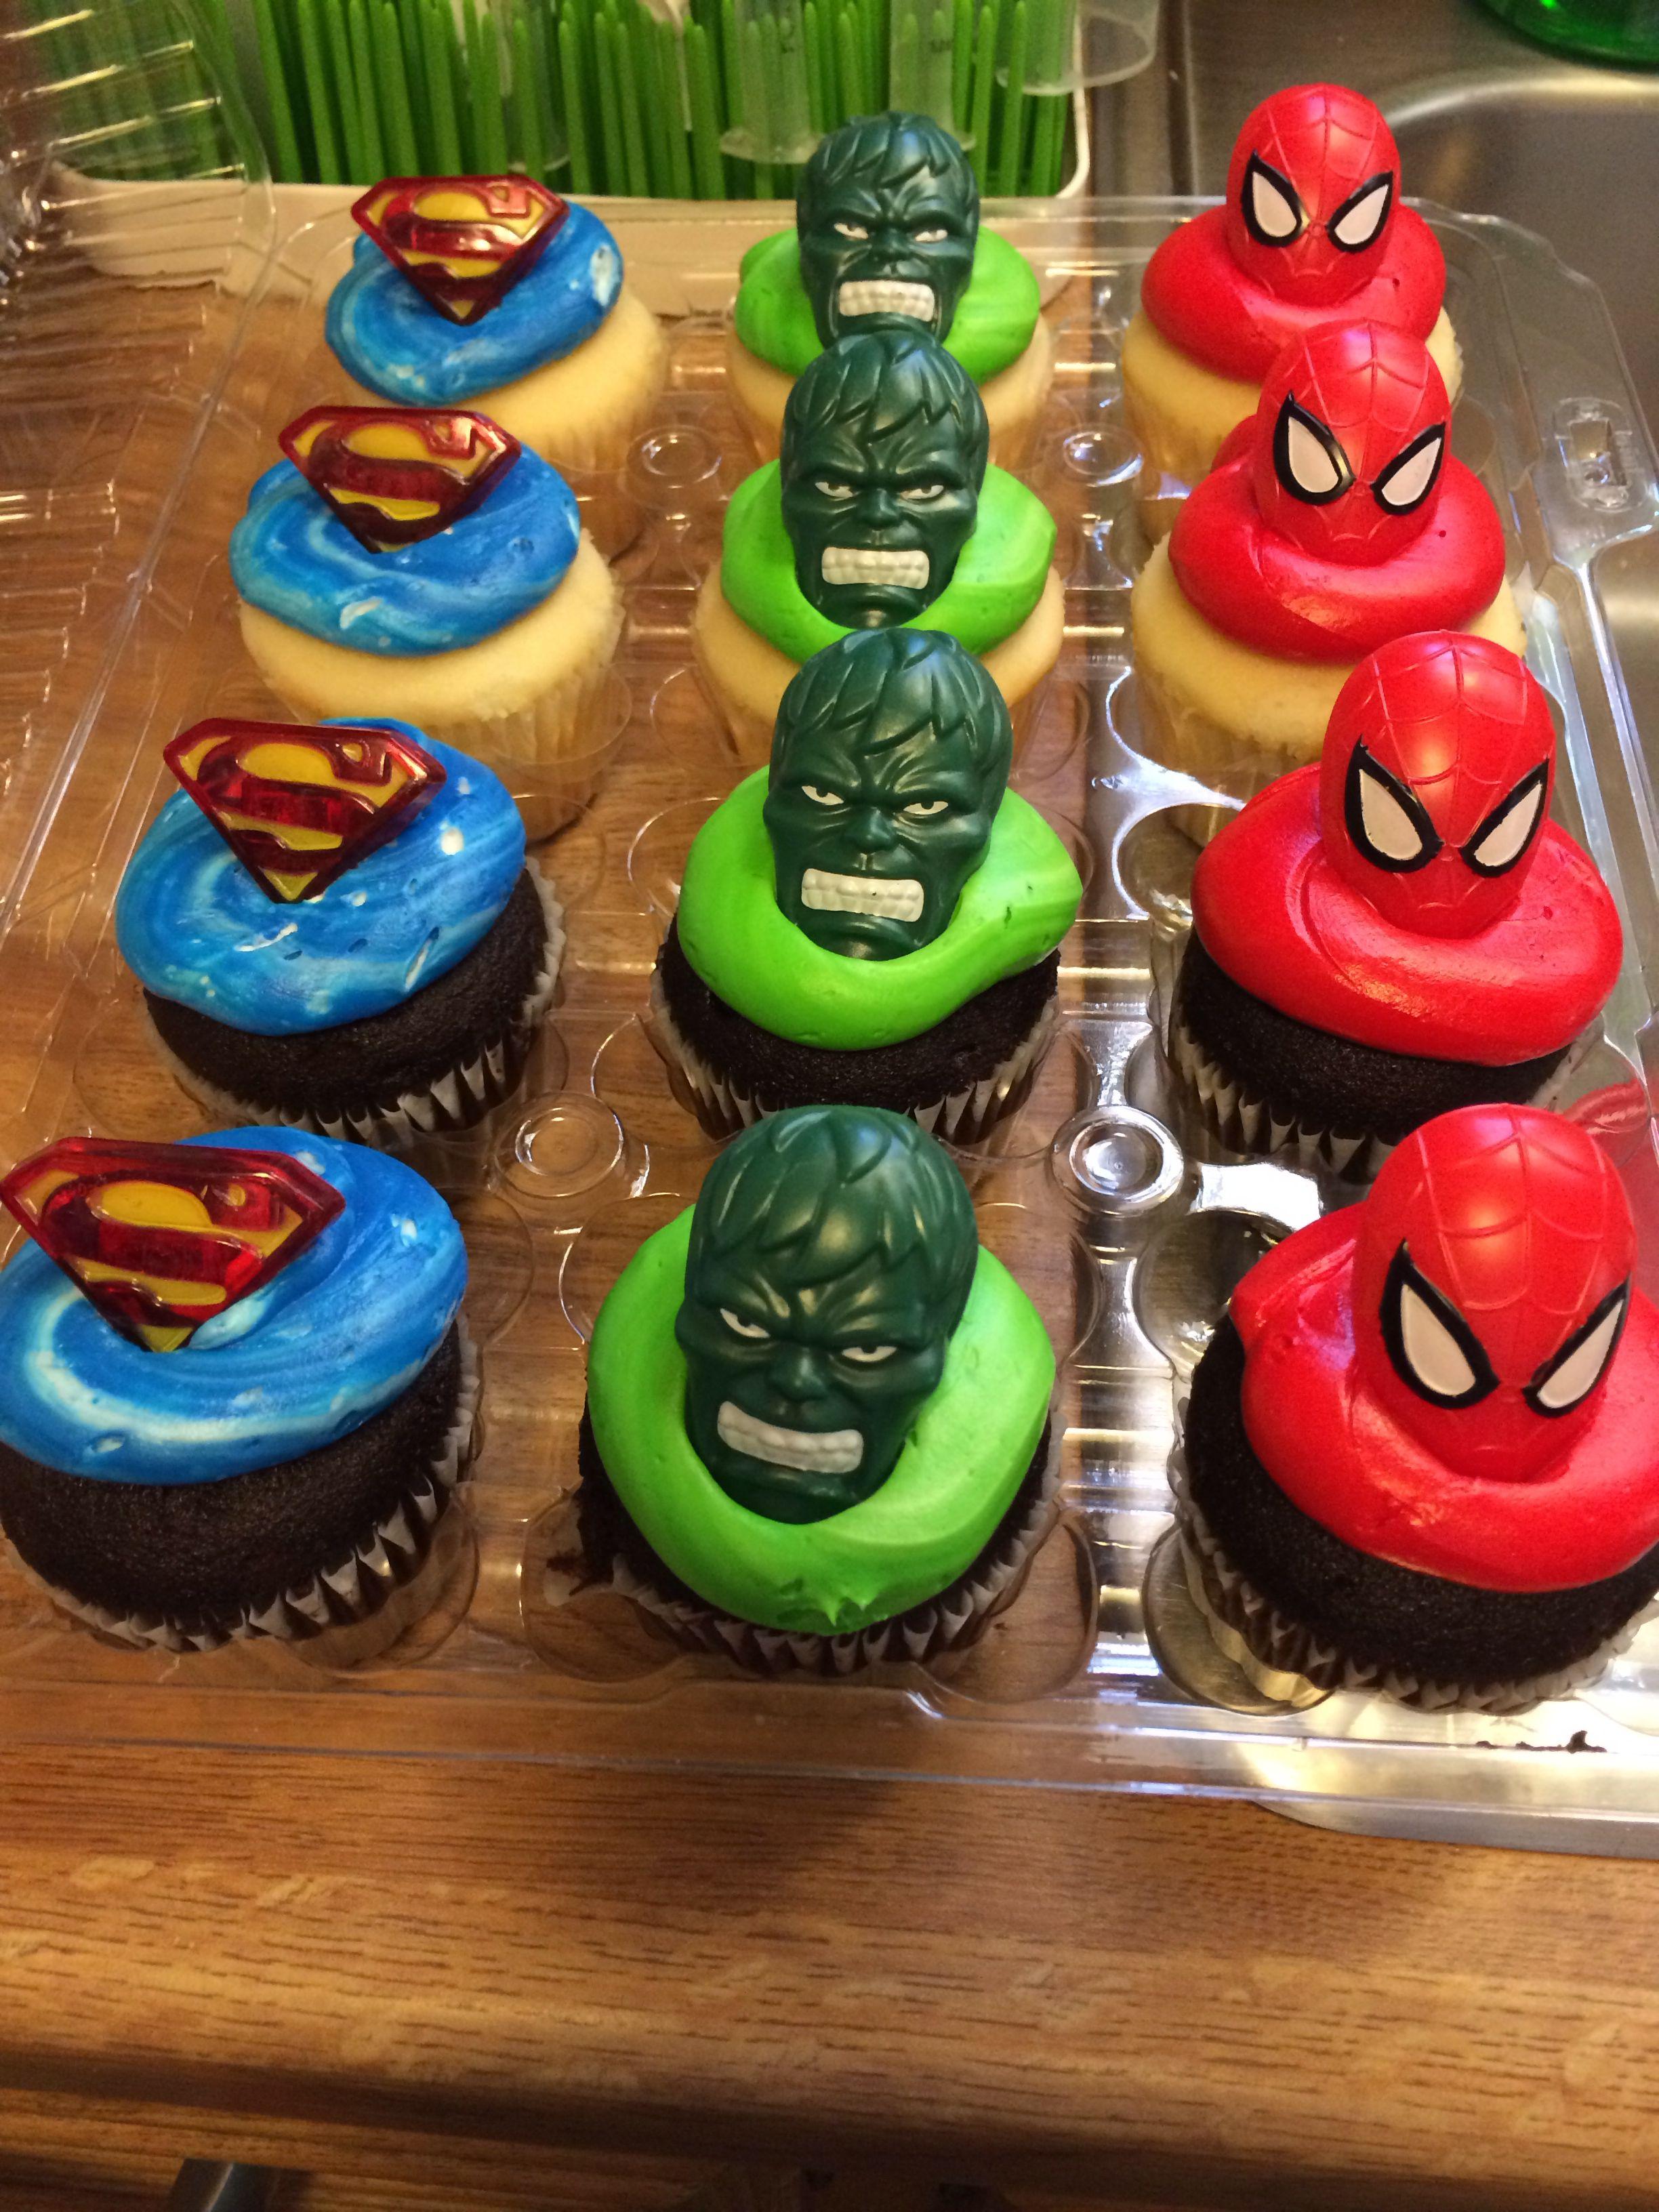 Superhero Rings On Store Bought Cupcakes Tom Thumb For Cheap Birthday Cake Kids Love